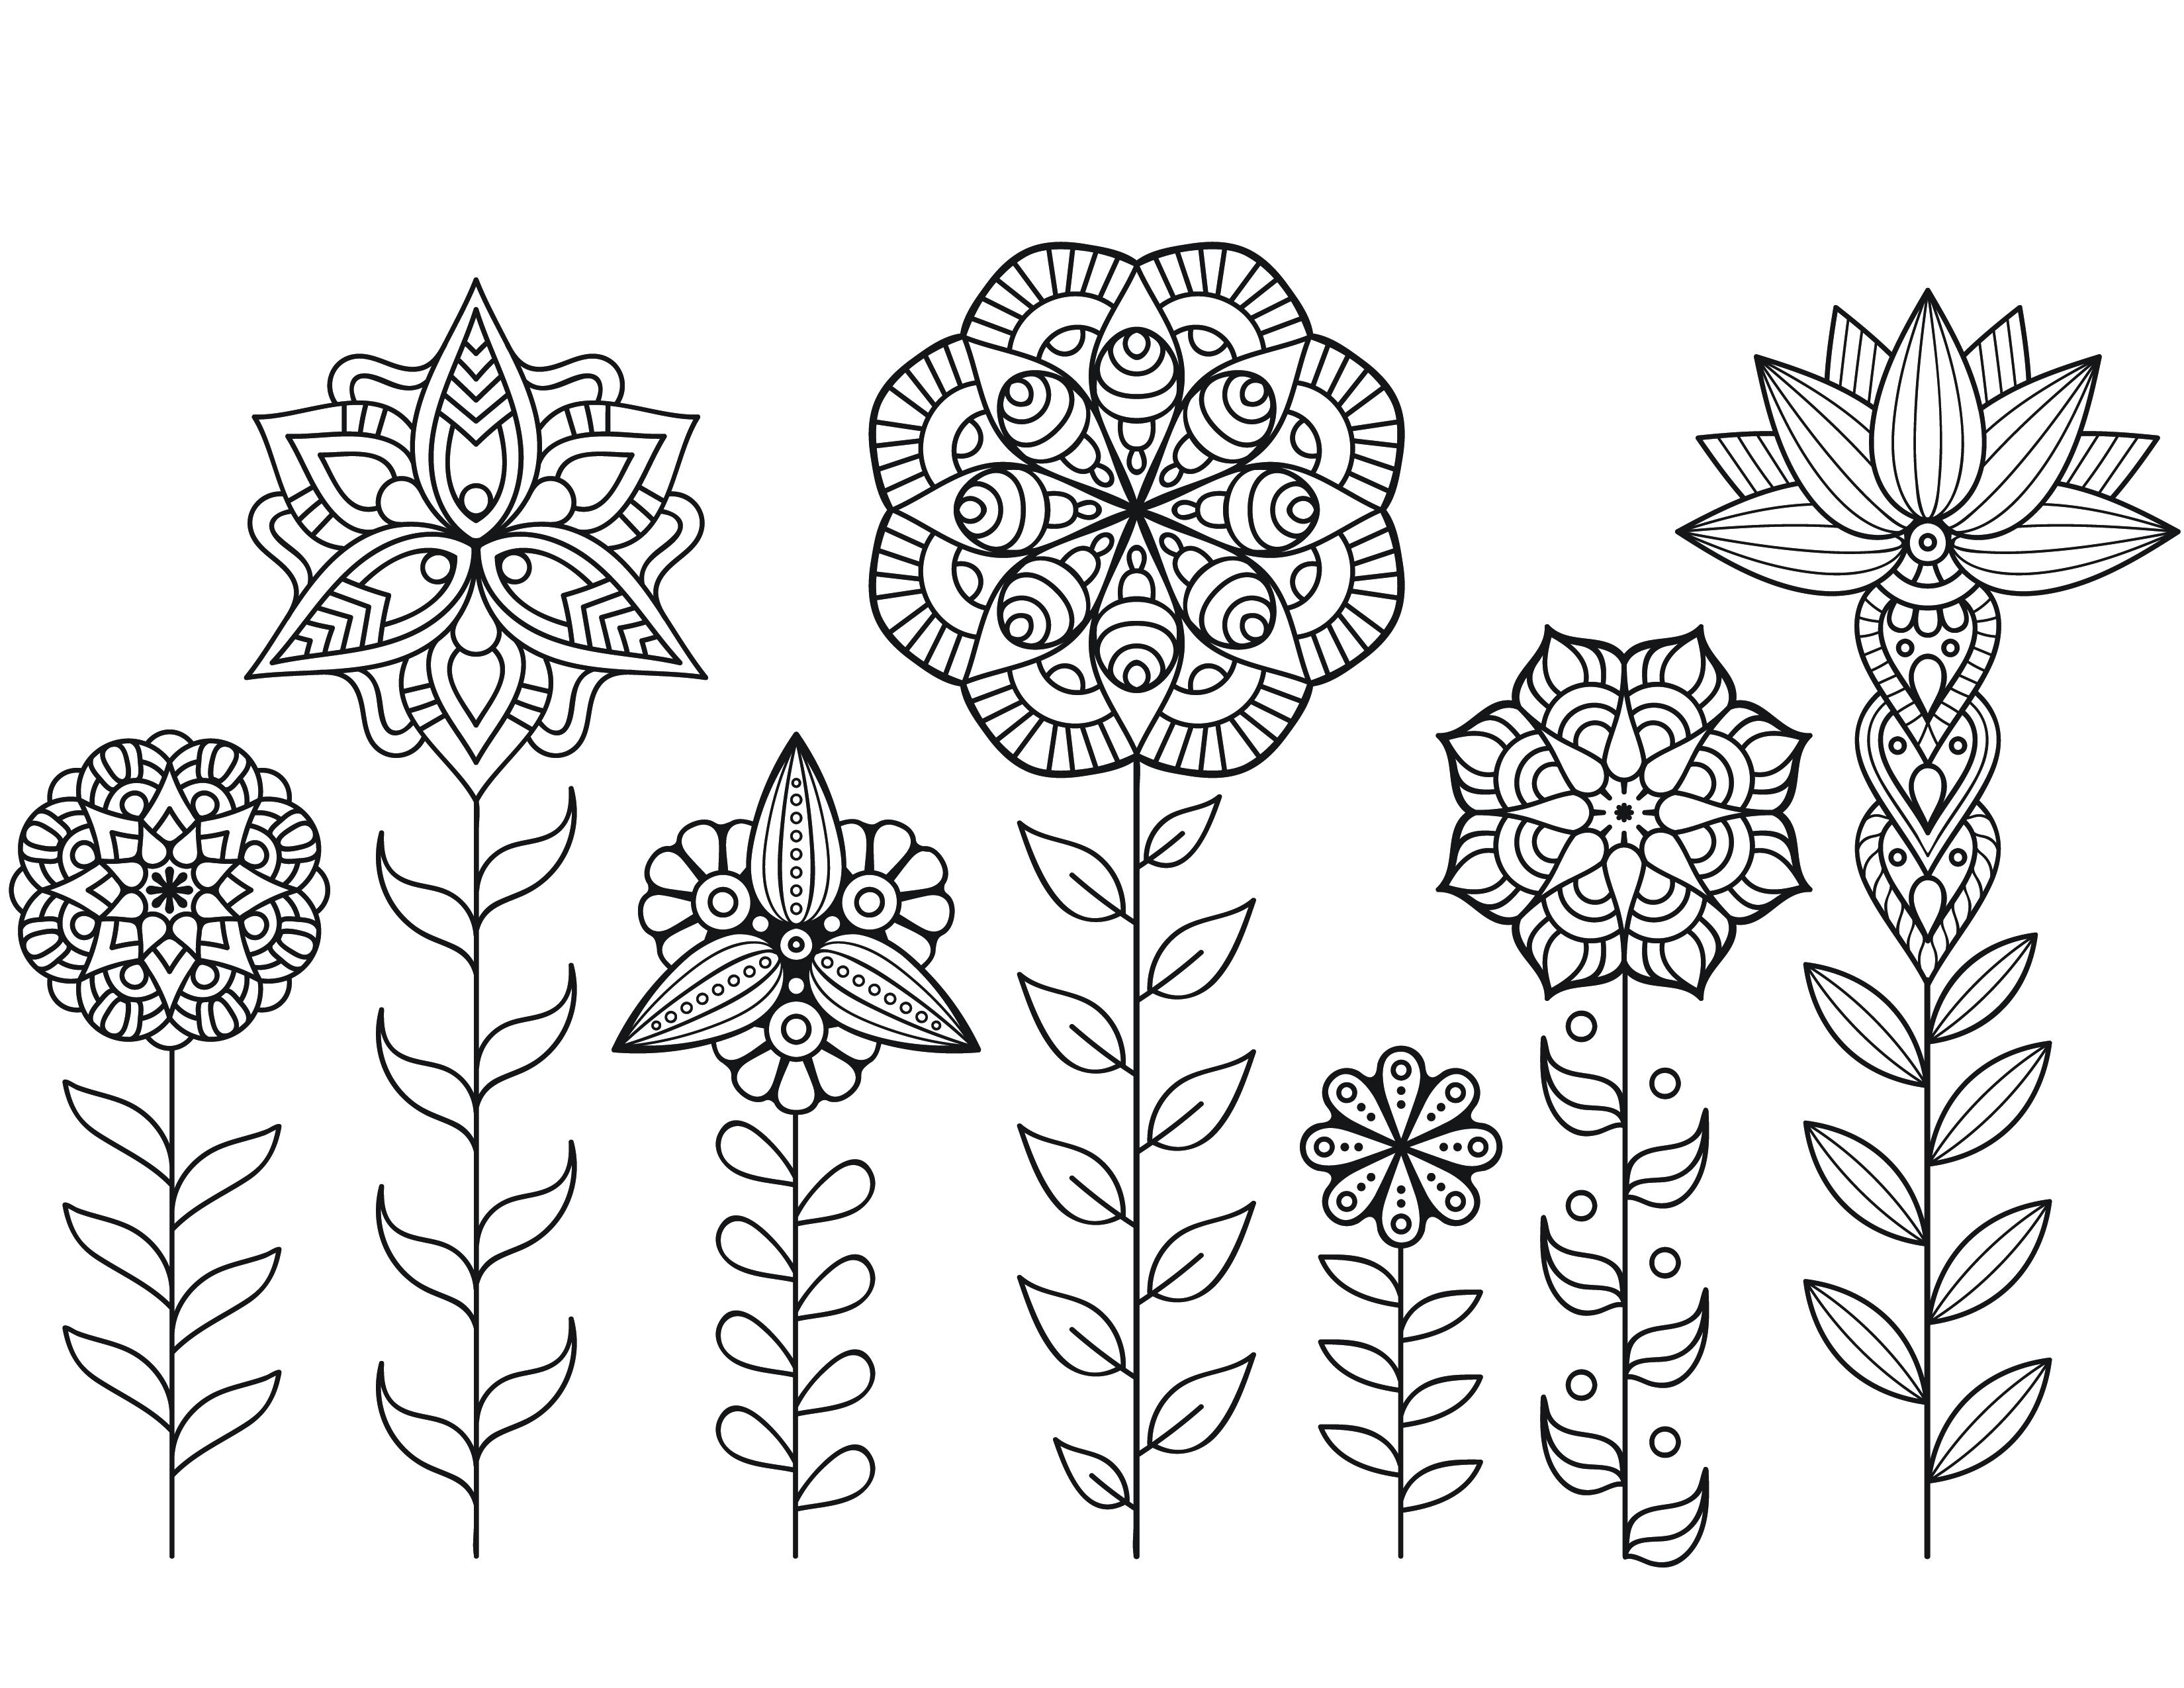 Dessin A Imprimer De Mandala Fleurs Automne - Artherapie.ca destiné Coloriage Mandala Disney À Imprimer Gratuit